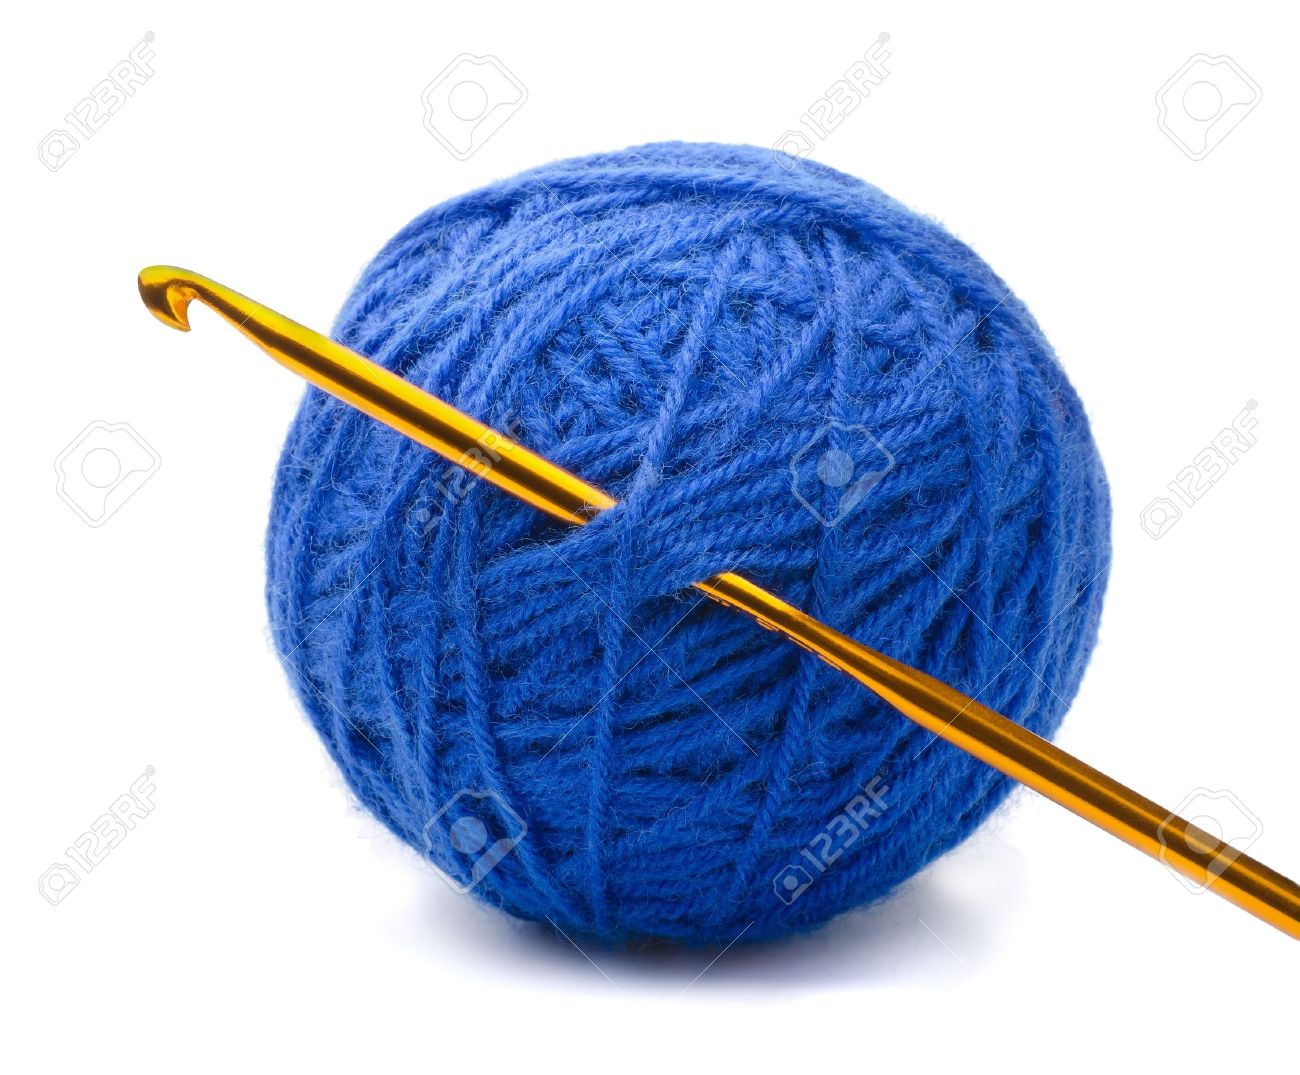 Crocheting Needles And Yarn